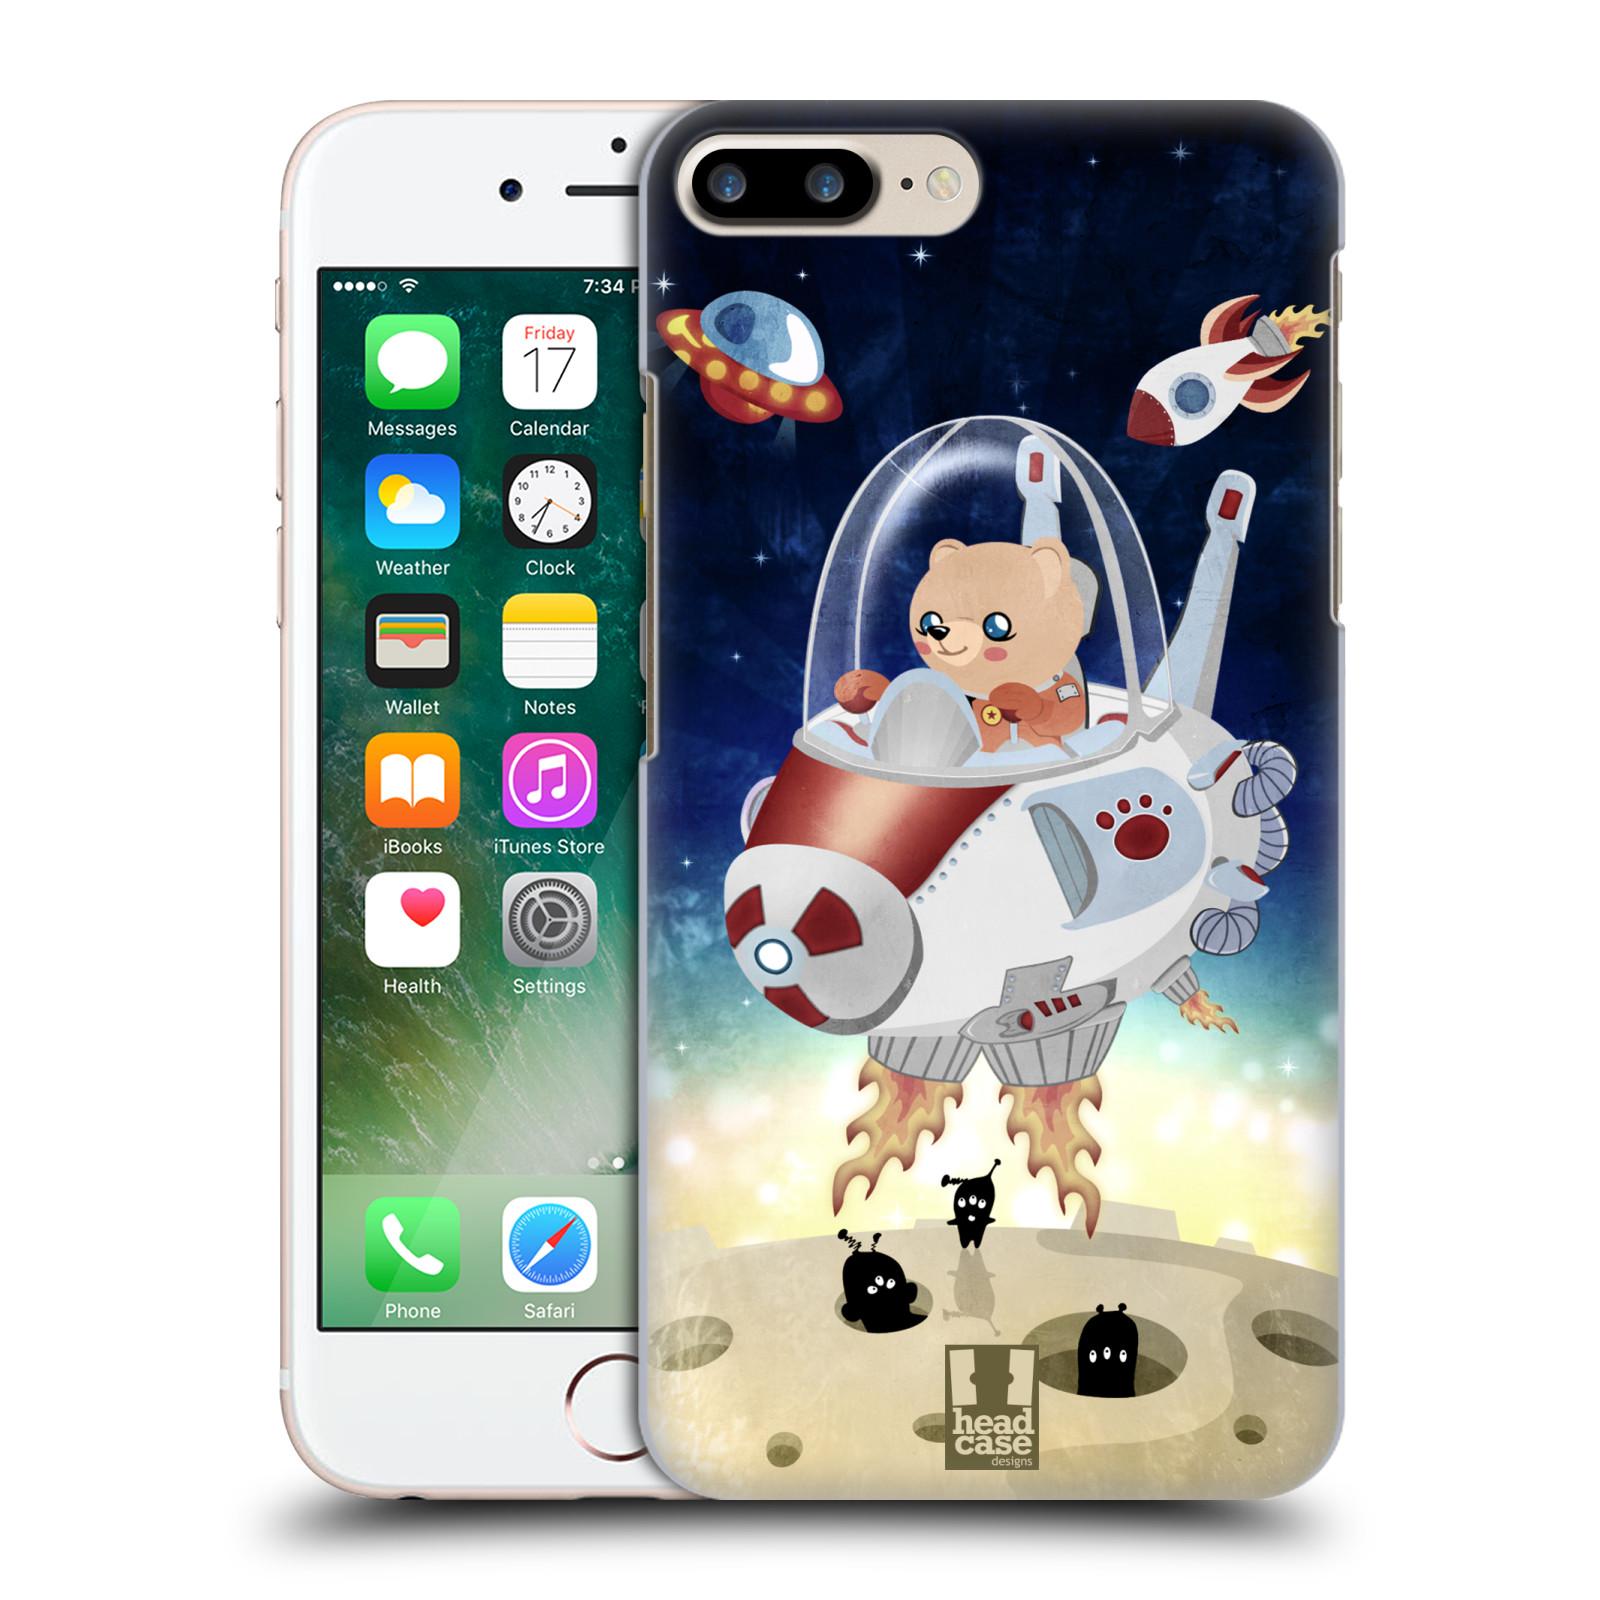 HEAD CASE plastový obal na mobil Apple Iphone 7 PLUS vzor Zvířecí astronauti medvídek